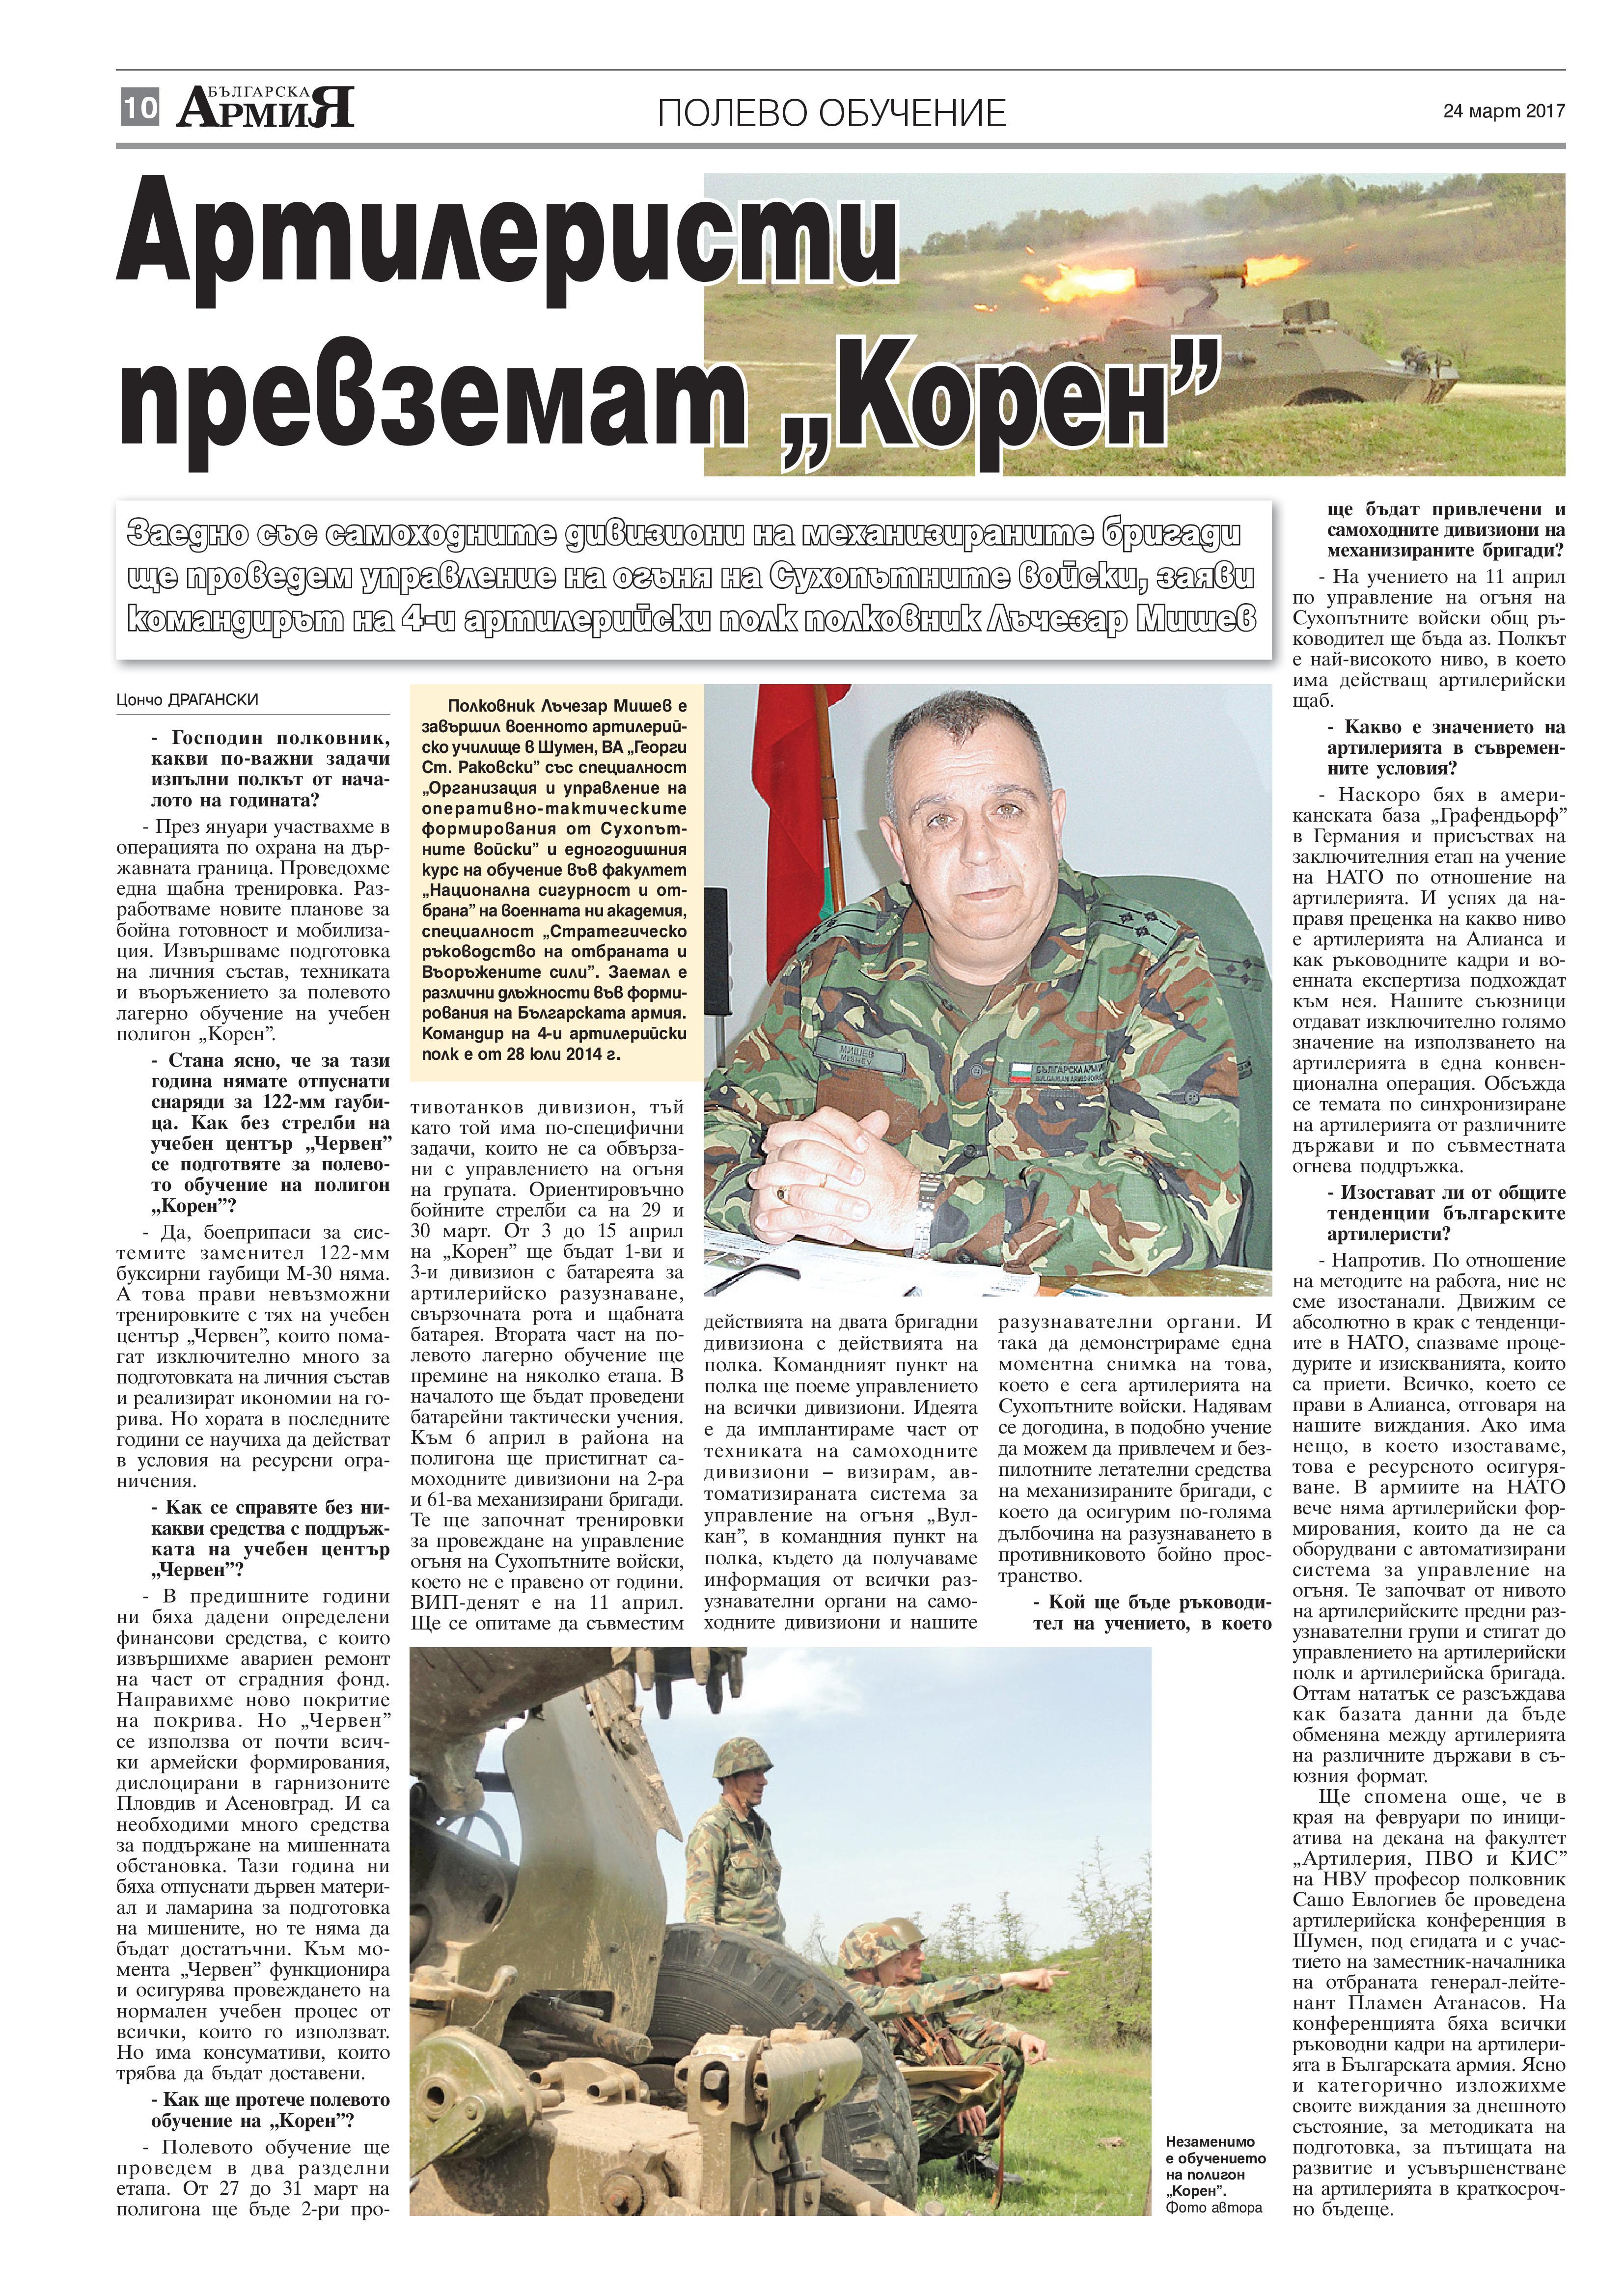 https://www.armymedia.bg/wp-content/uploads/2017/03/10-1.jpg